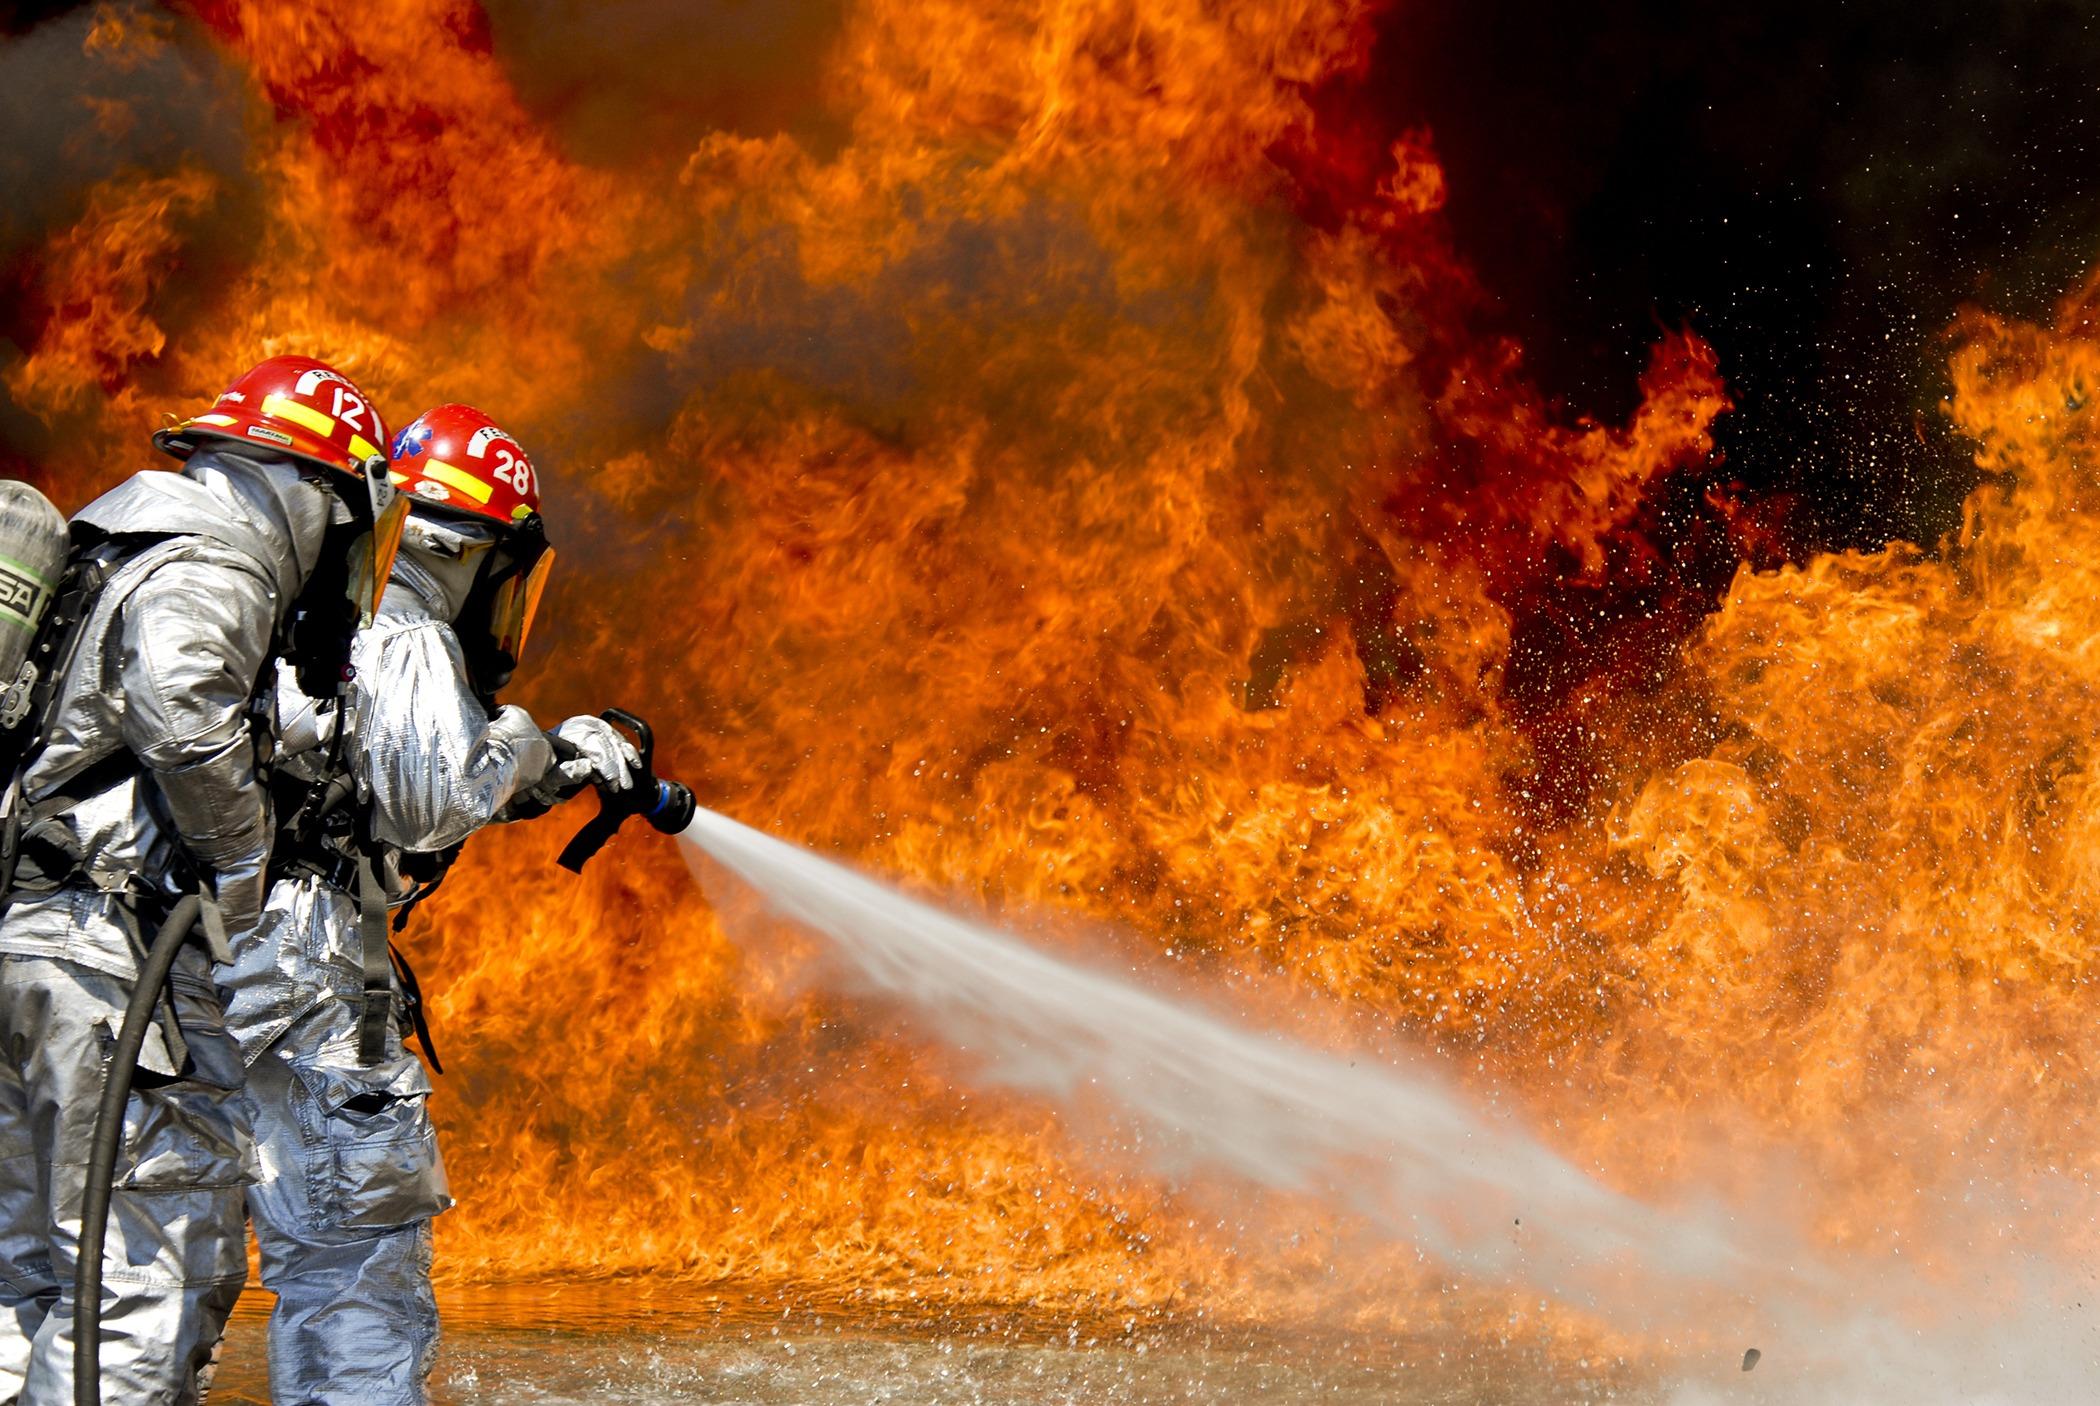 Flame Fire Men Volunteer Hero Firefighter Firefighters Screenshot Wildfire Firemen Hose Computer Wallpaper Geological Phenomenon